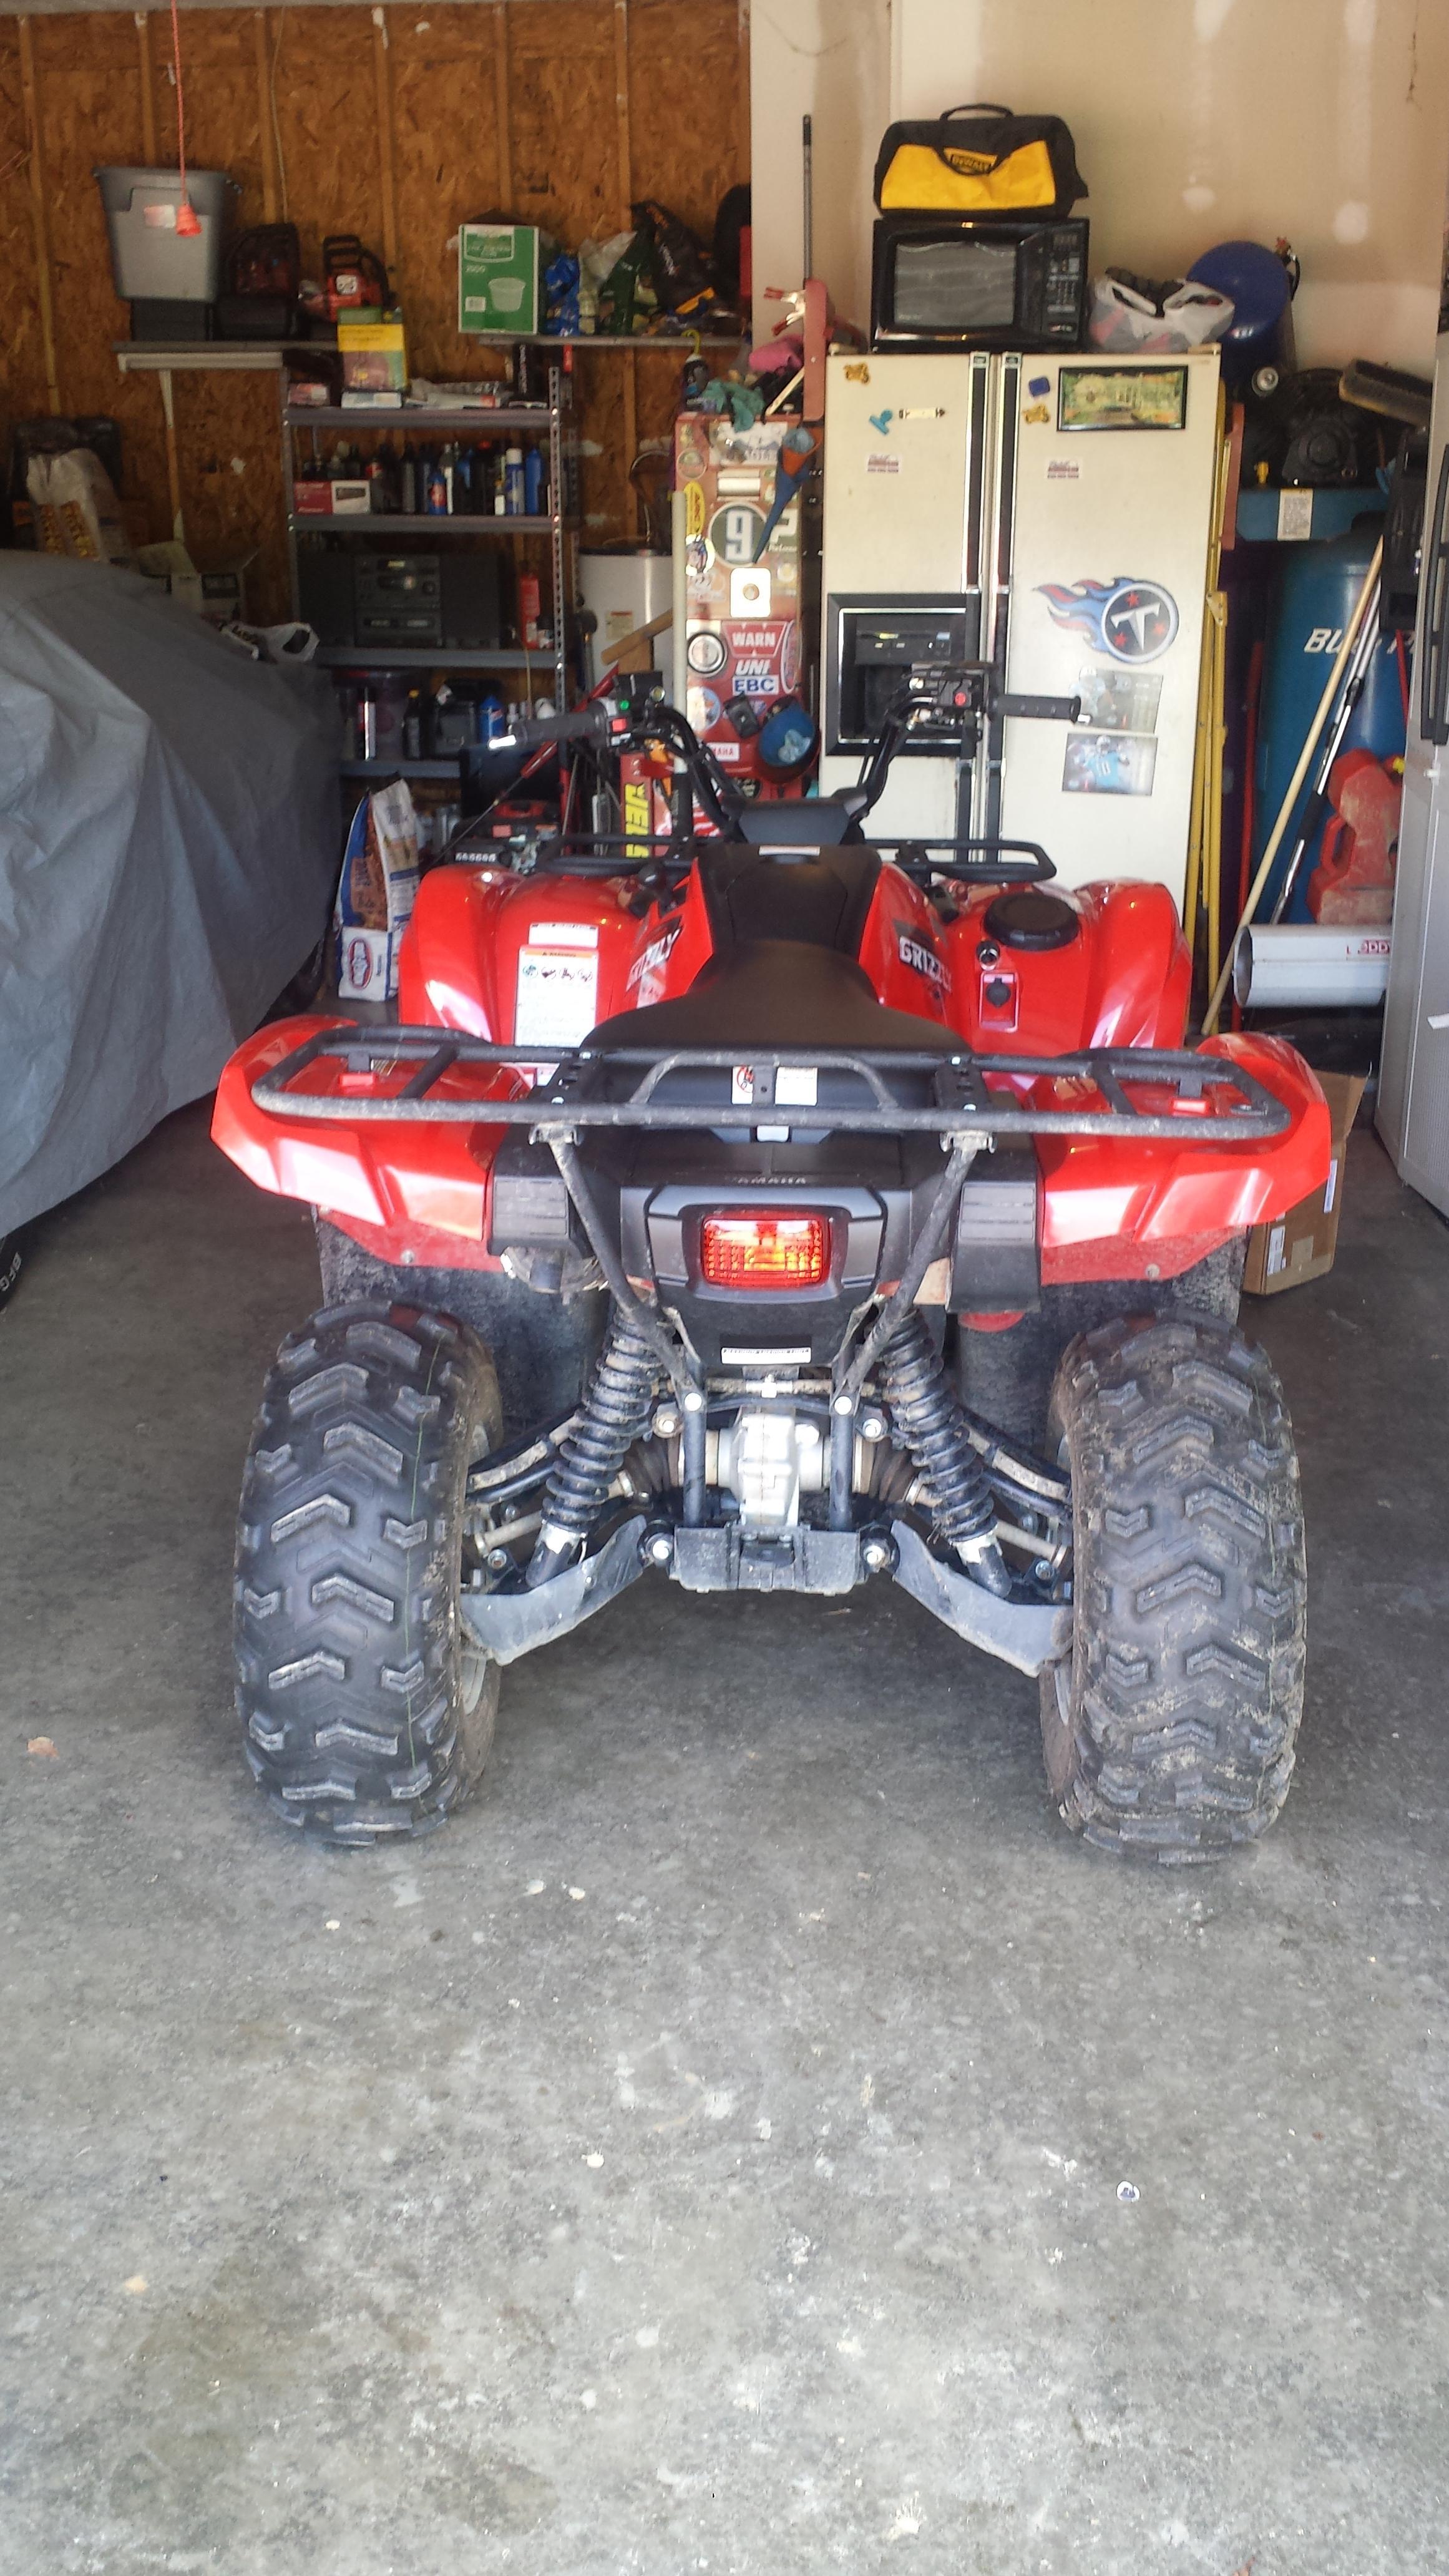 Craigslist Finds - Yamaha Grizzly ATV Forum